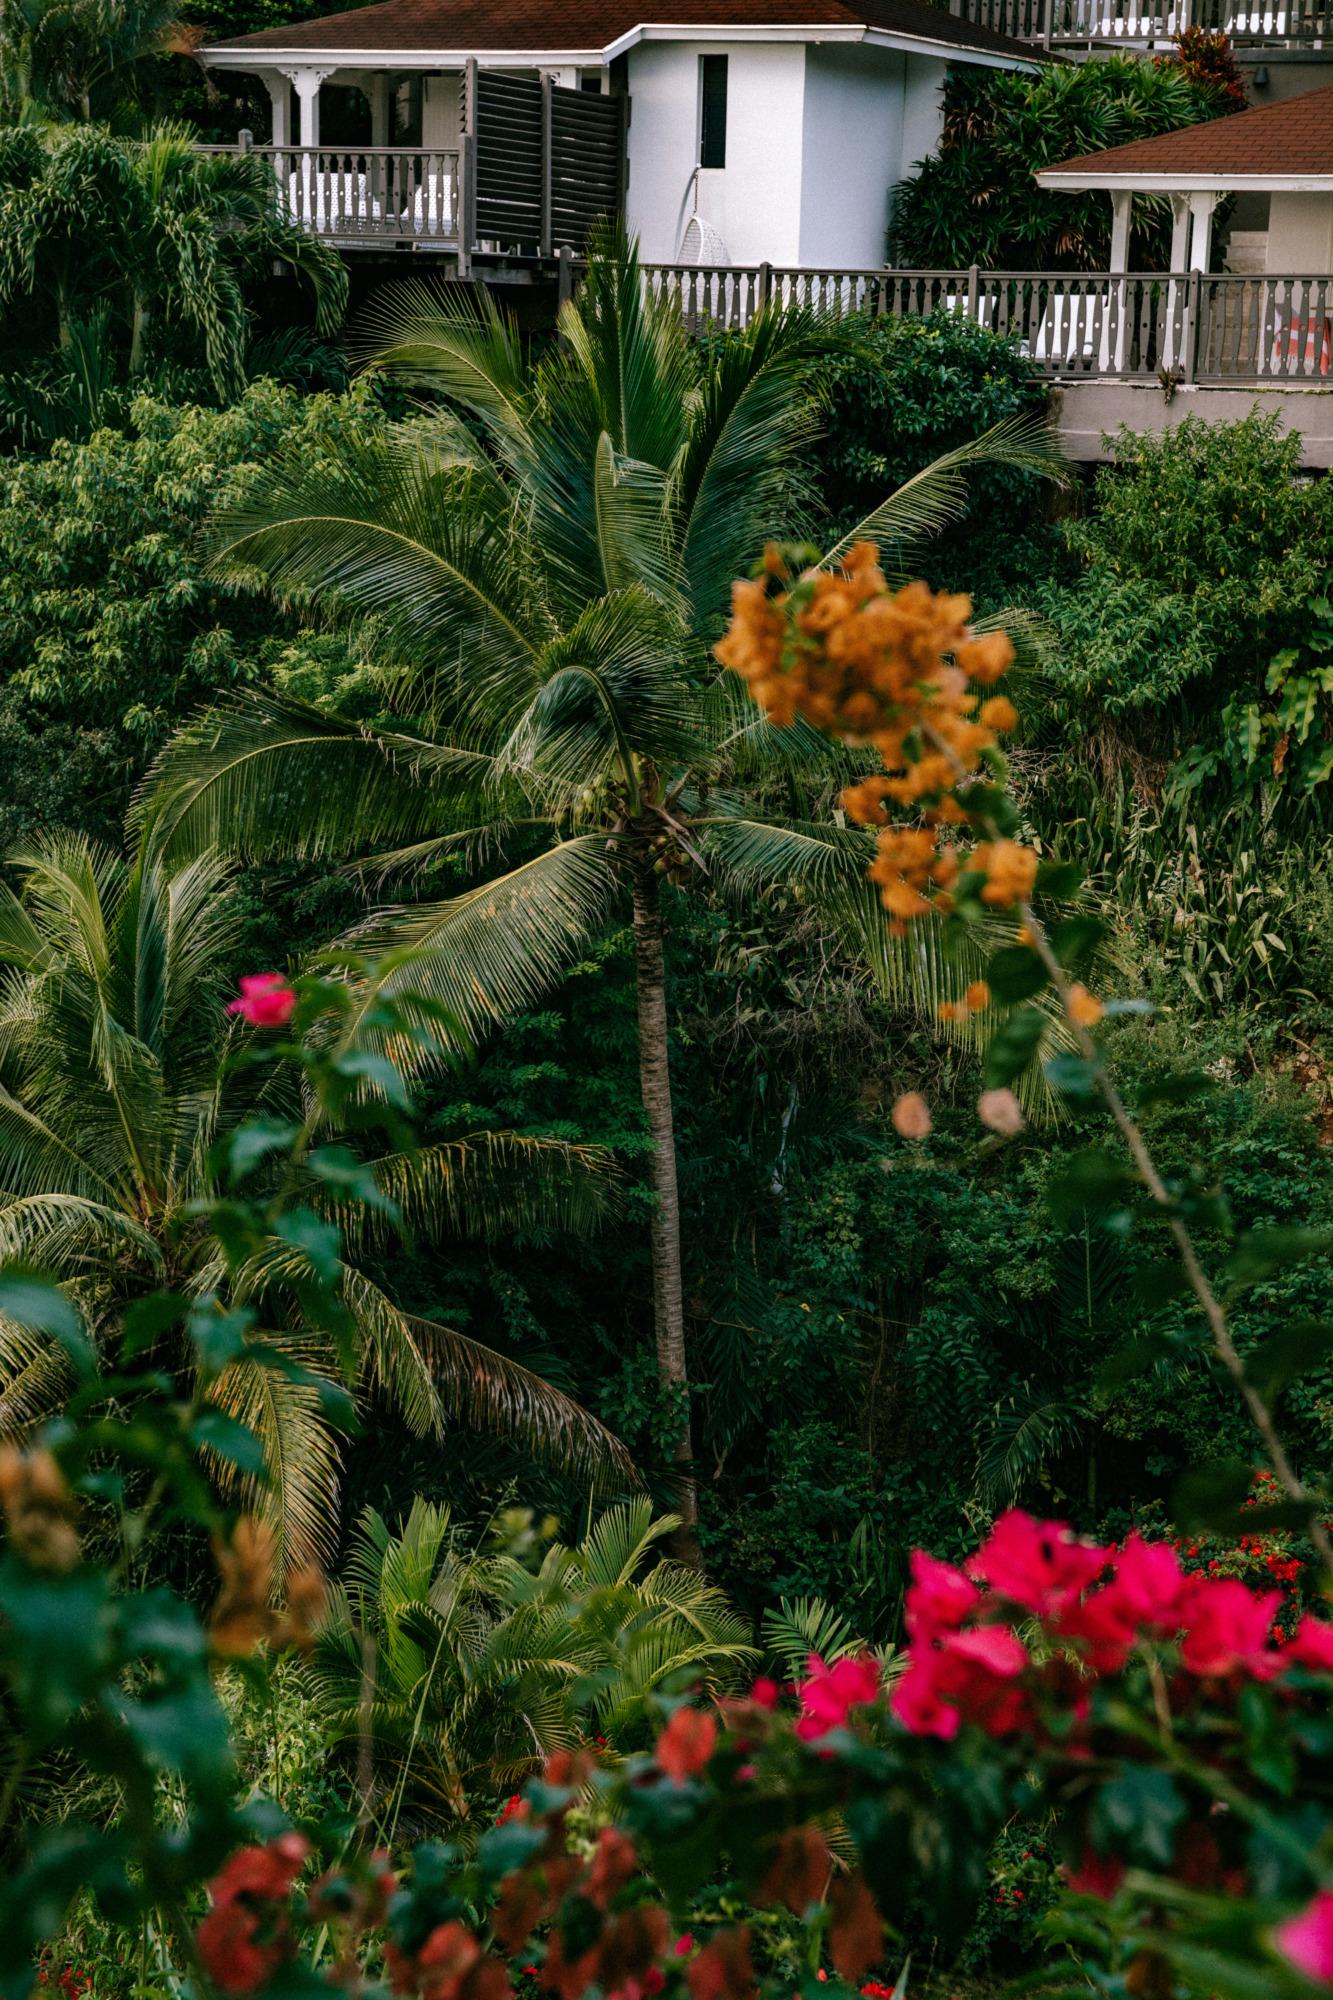 Visiter la Guadeloupe - Blondie Baby blog voyages